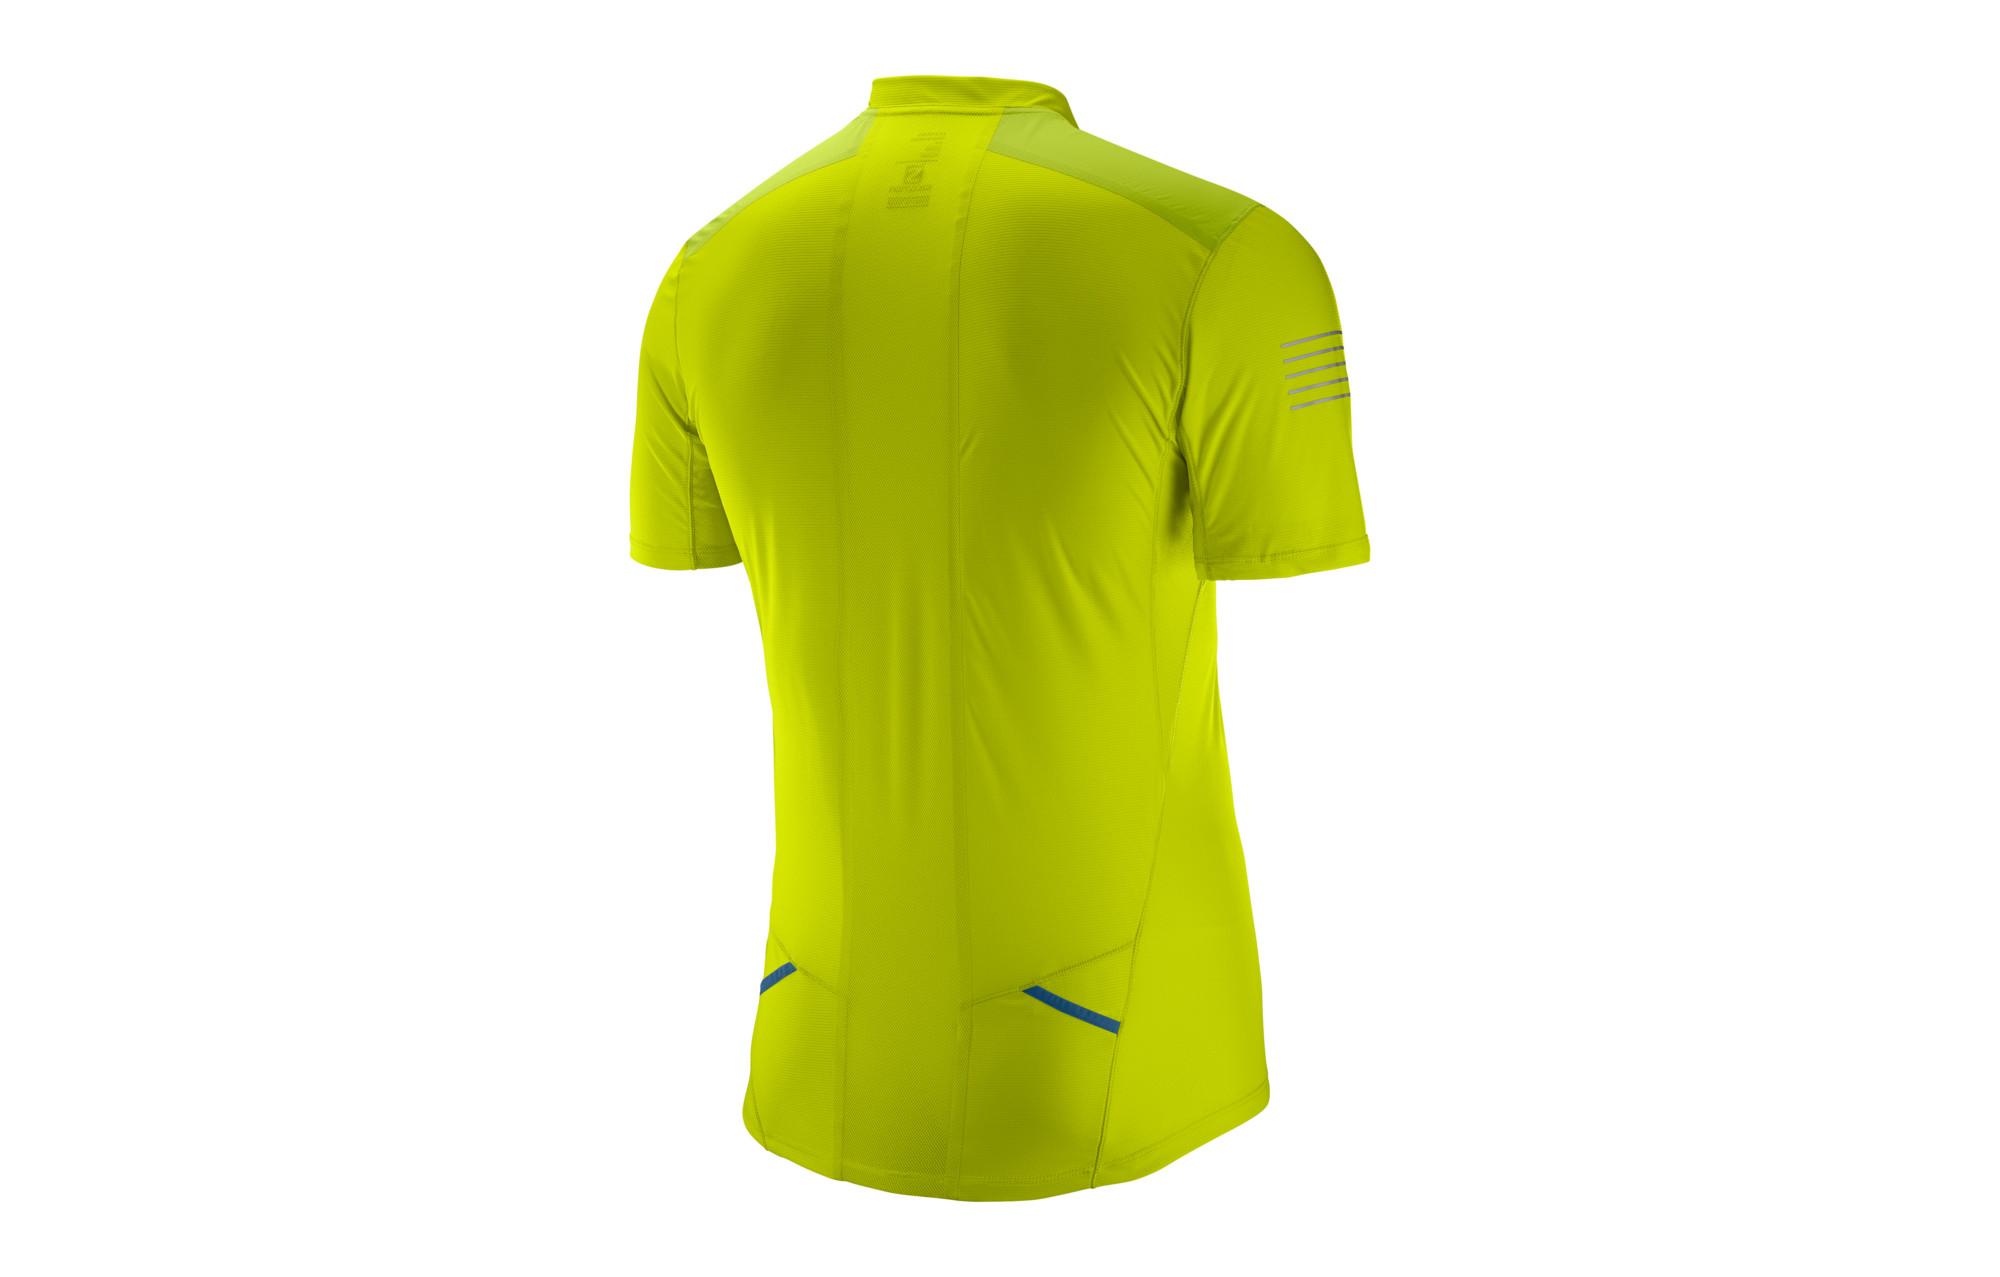 Salomon Jersey Short Sleeve Fast Wing Yellow  fa44986bffb99